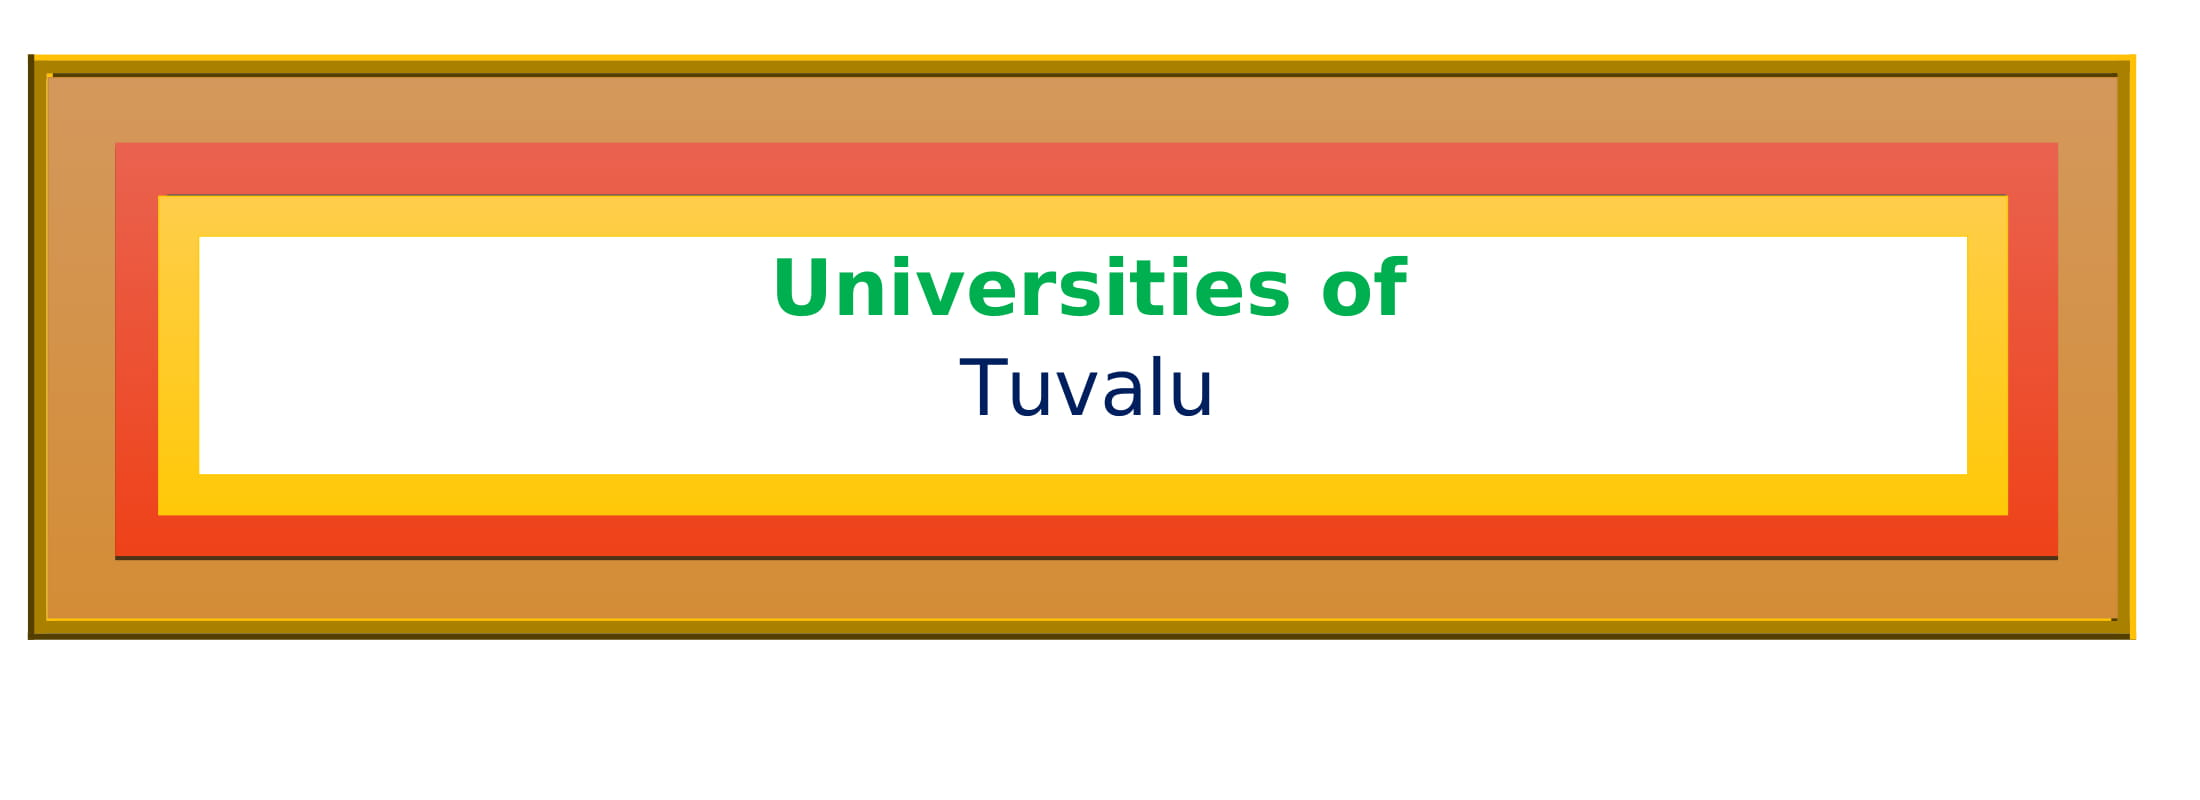 List of Universities in Vanuatu